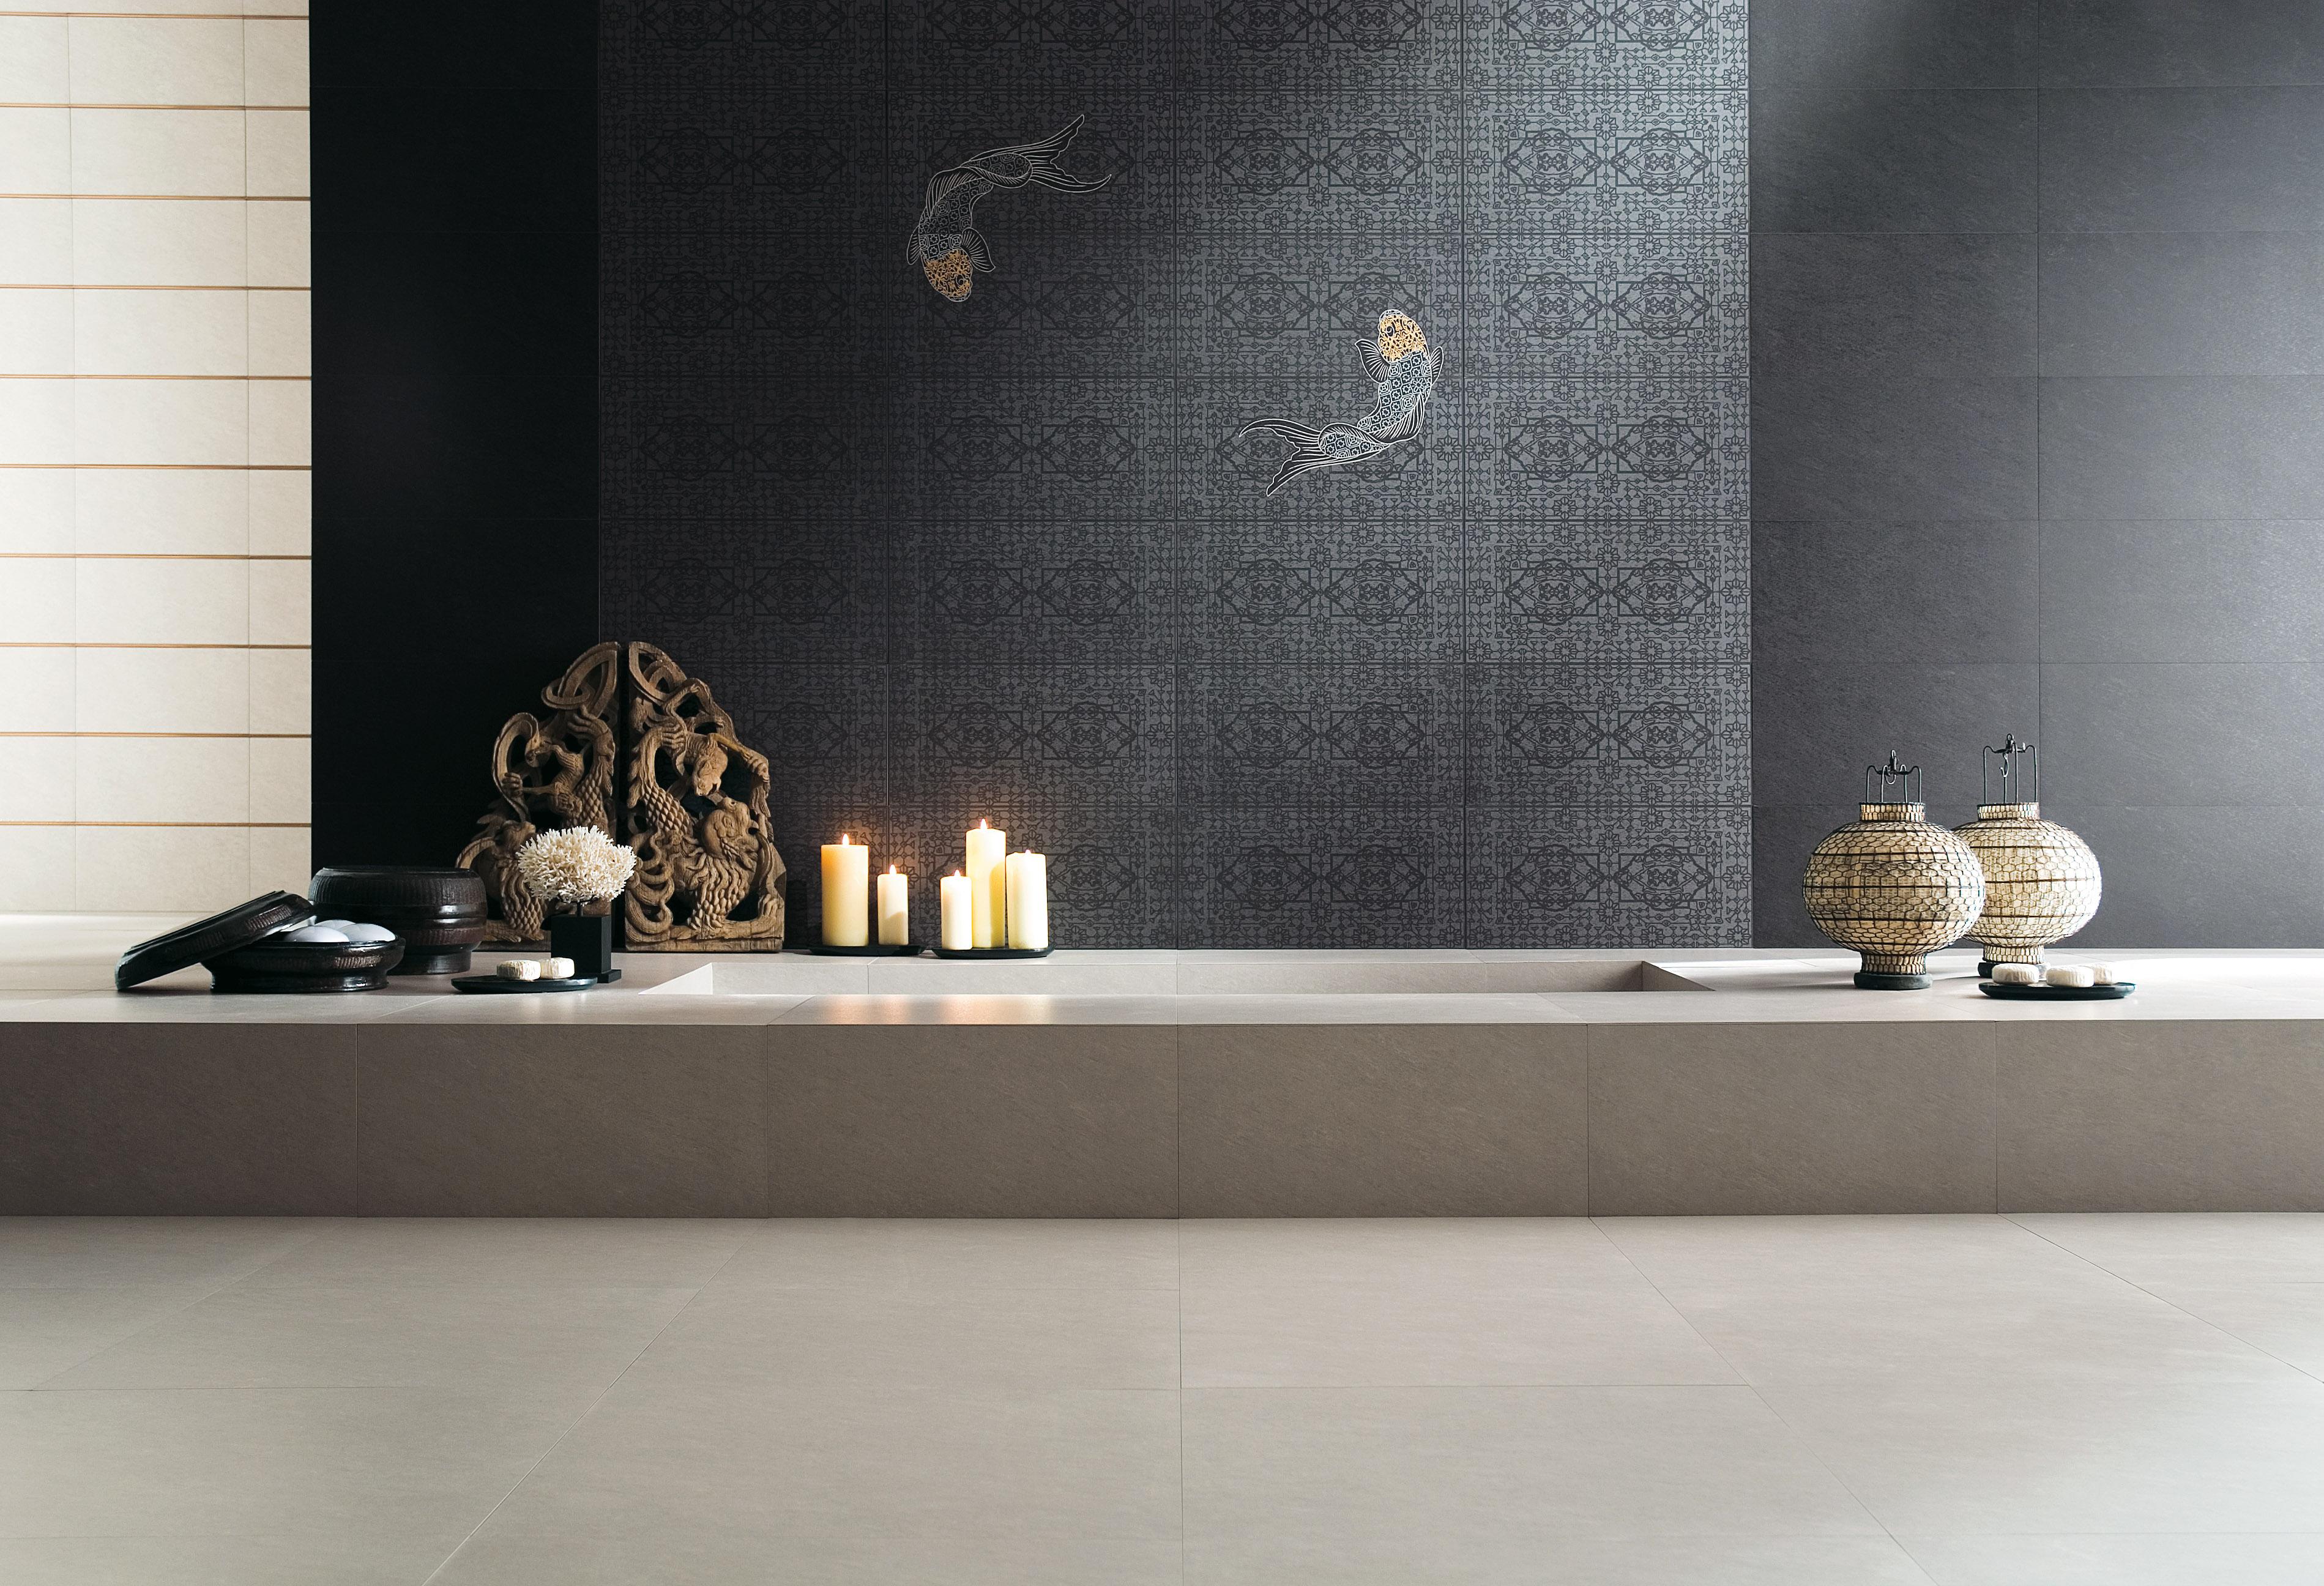 Carrelage salle de bain samsara ardoise perle novoceram - Carrelage salle de bain original ...